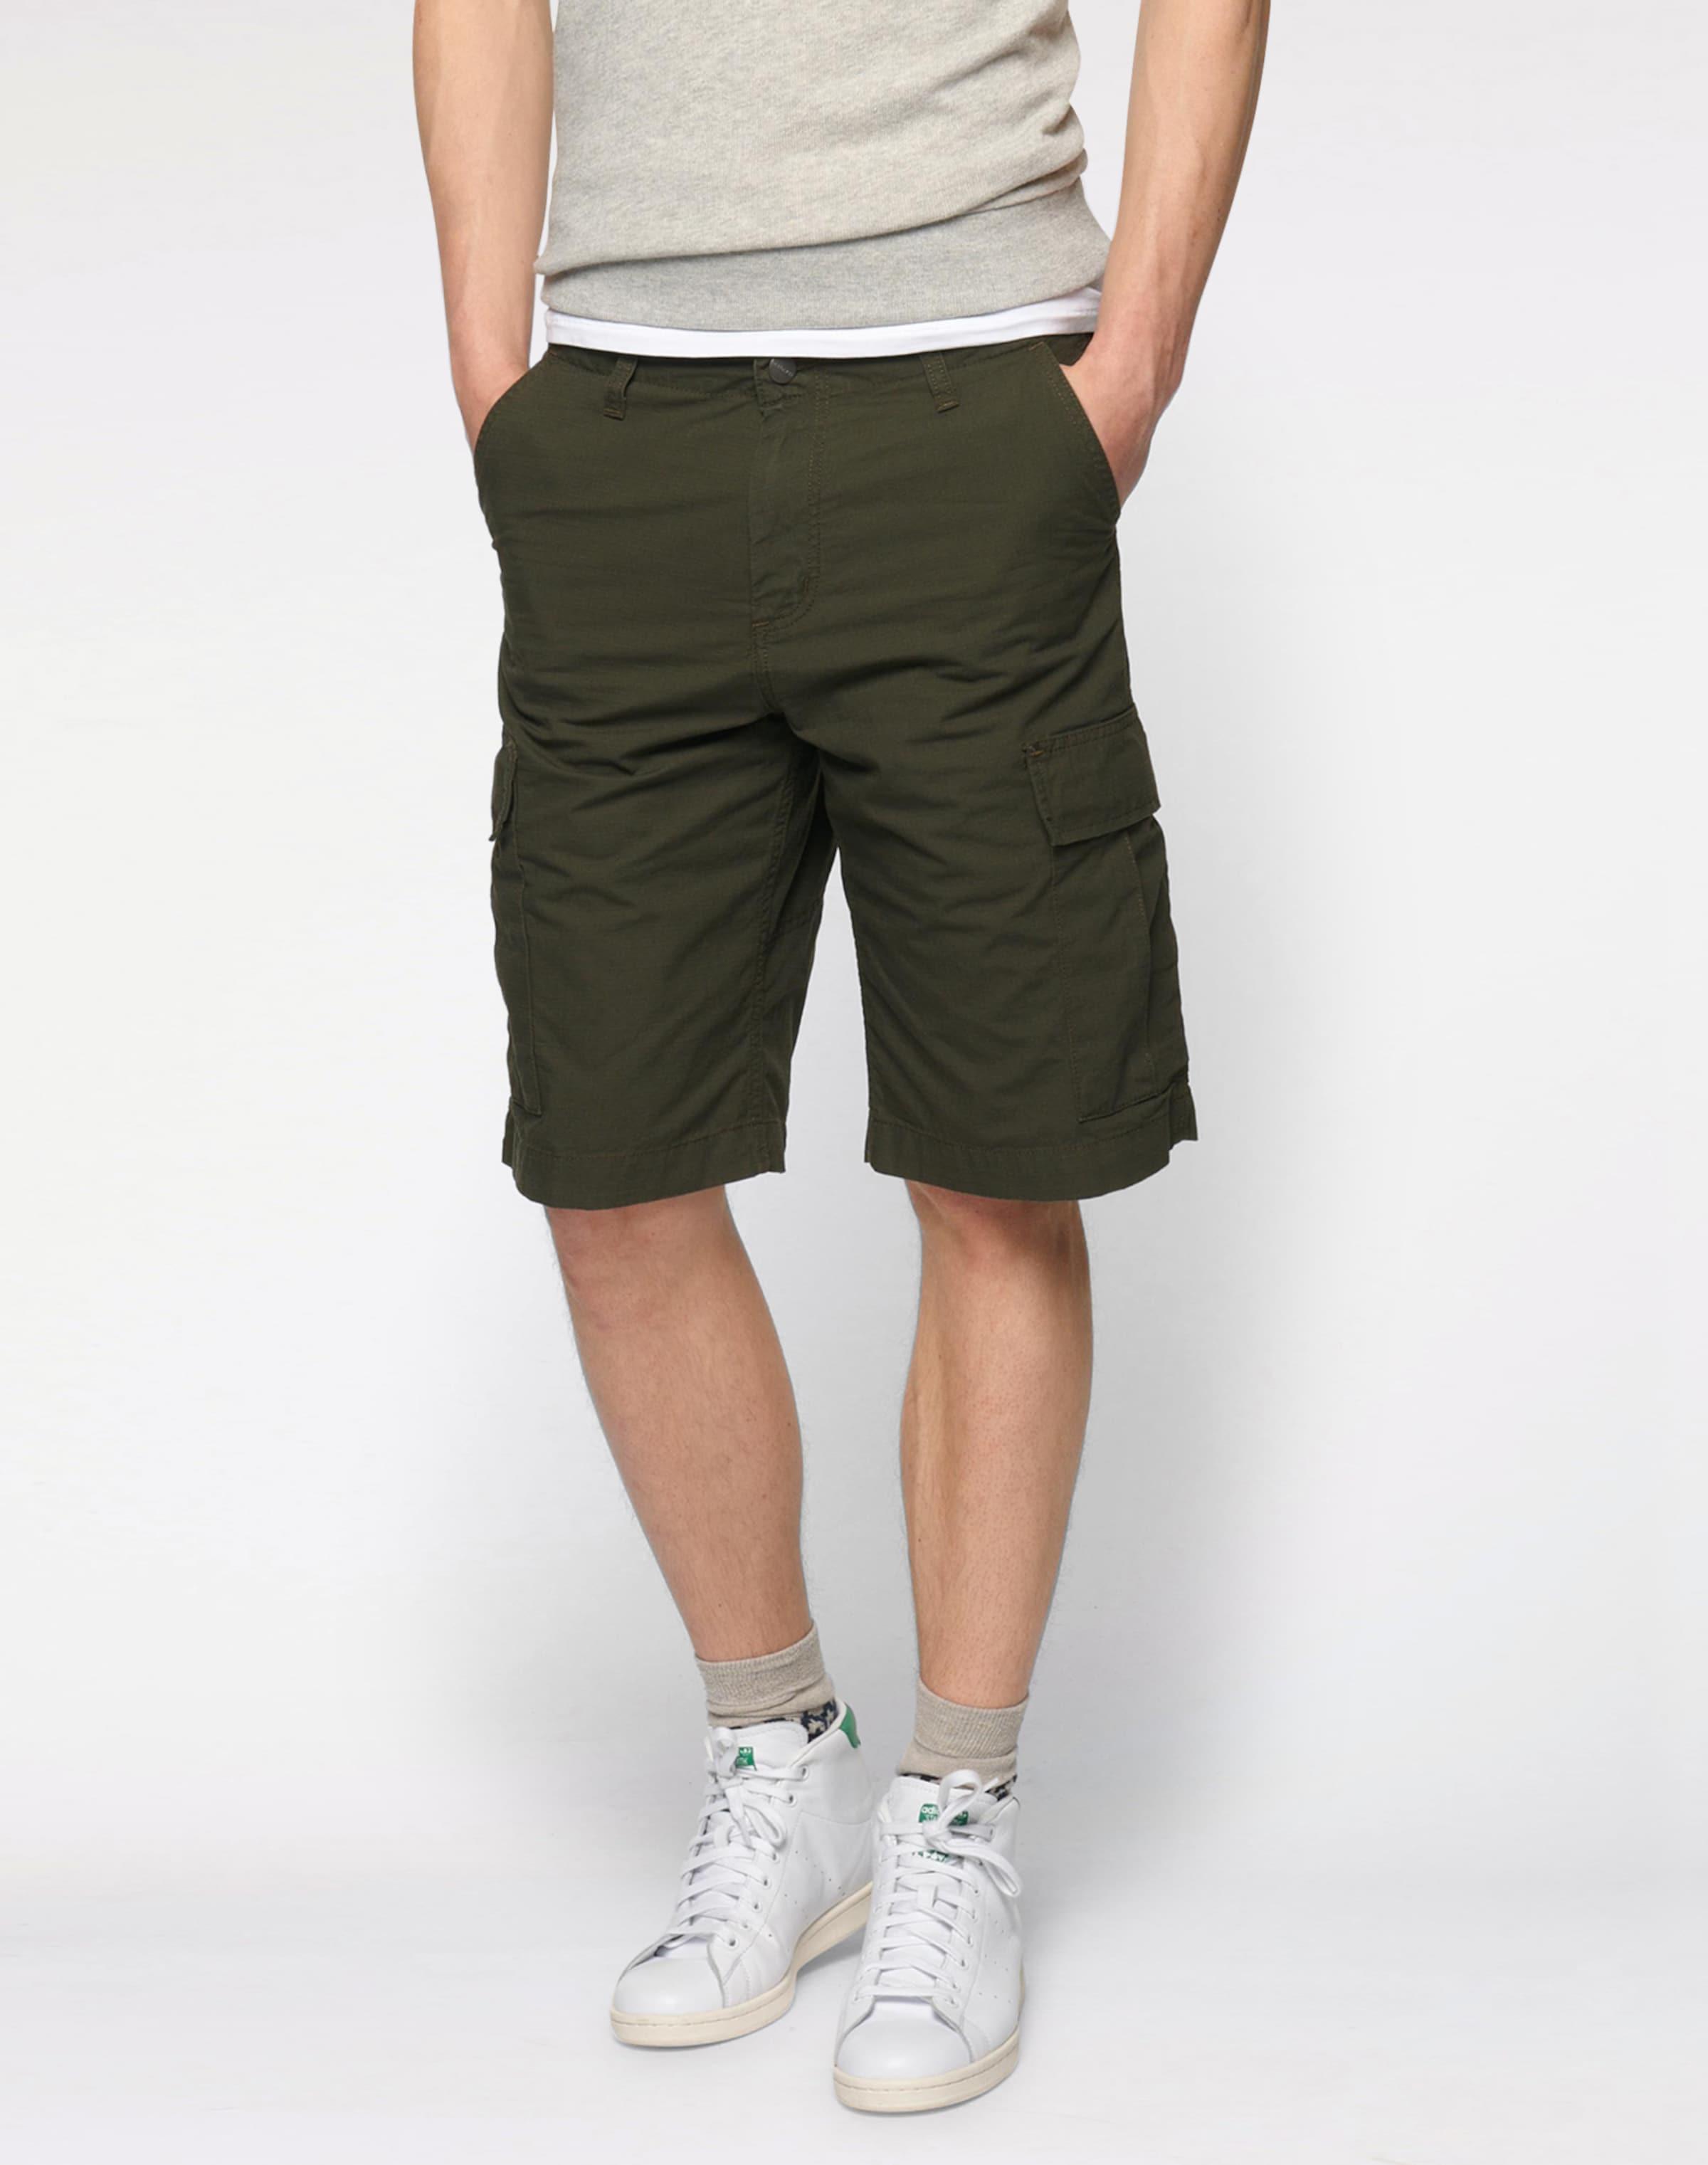 Carhartt Cargo Pantalon En Olive Wip Nn0kPXZ8wO